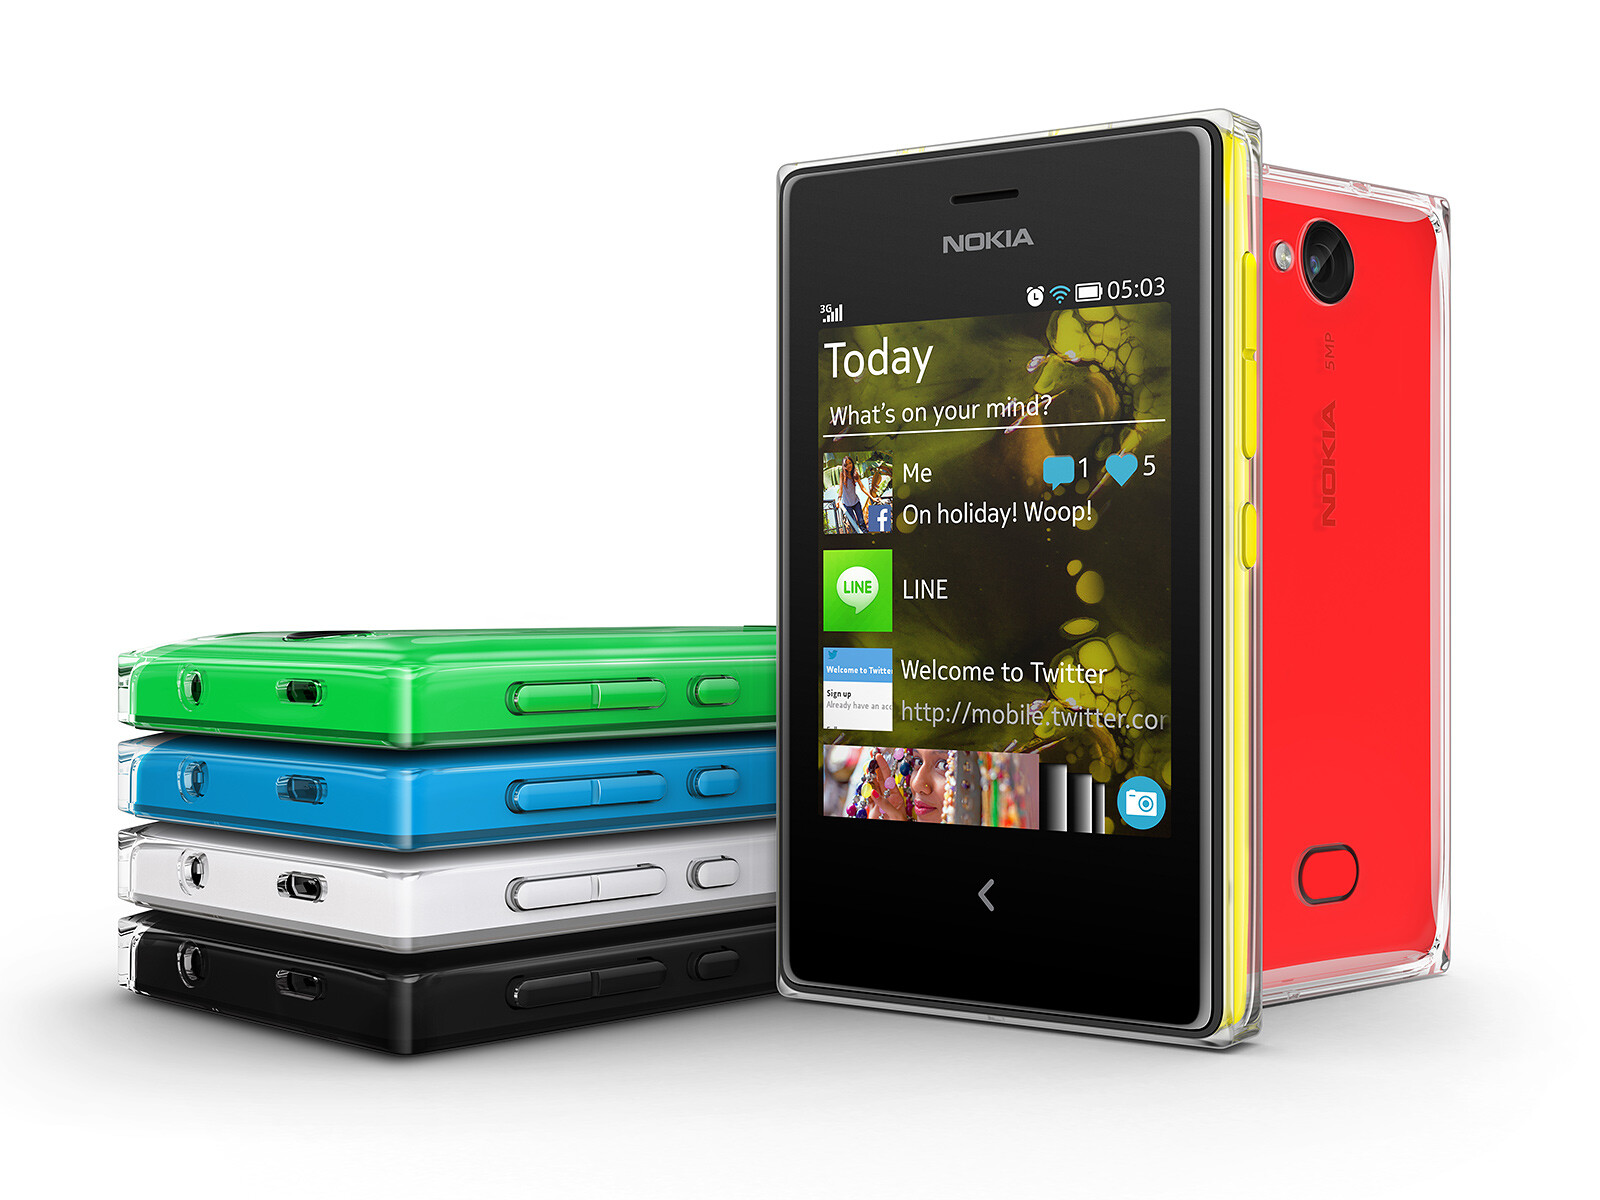 Nokia Asha 503 Specs